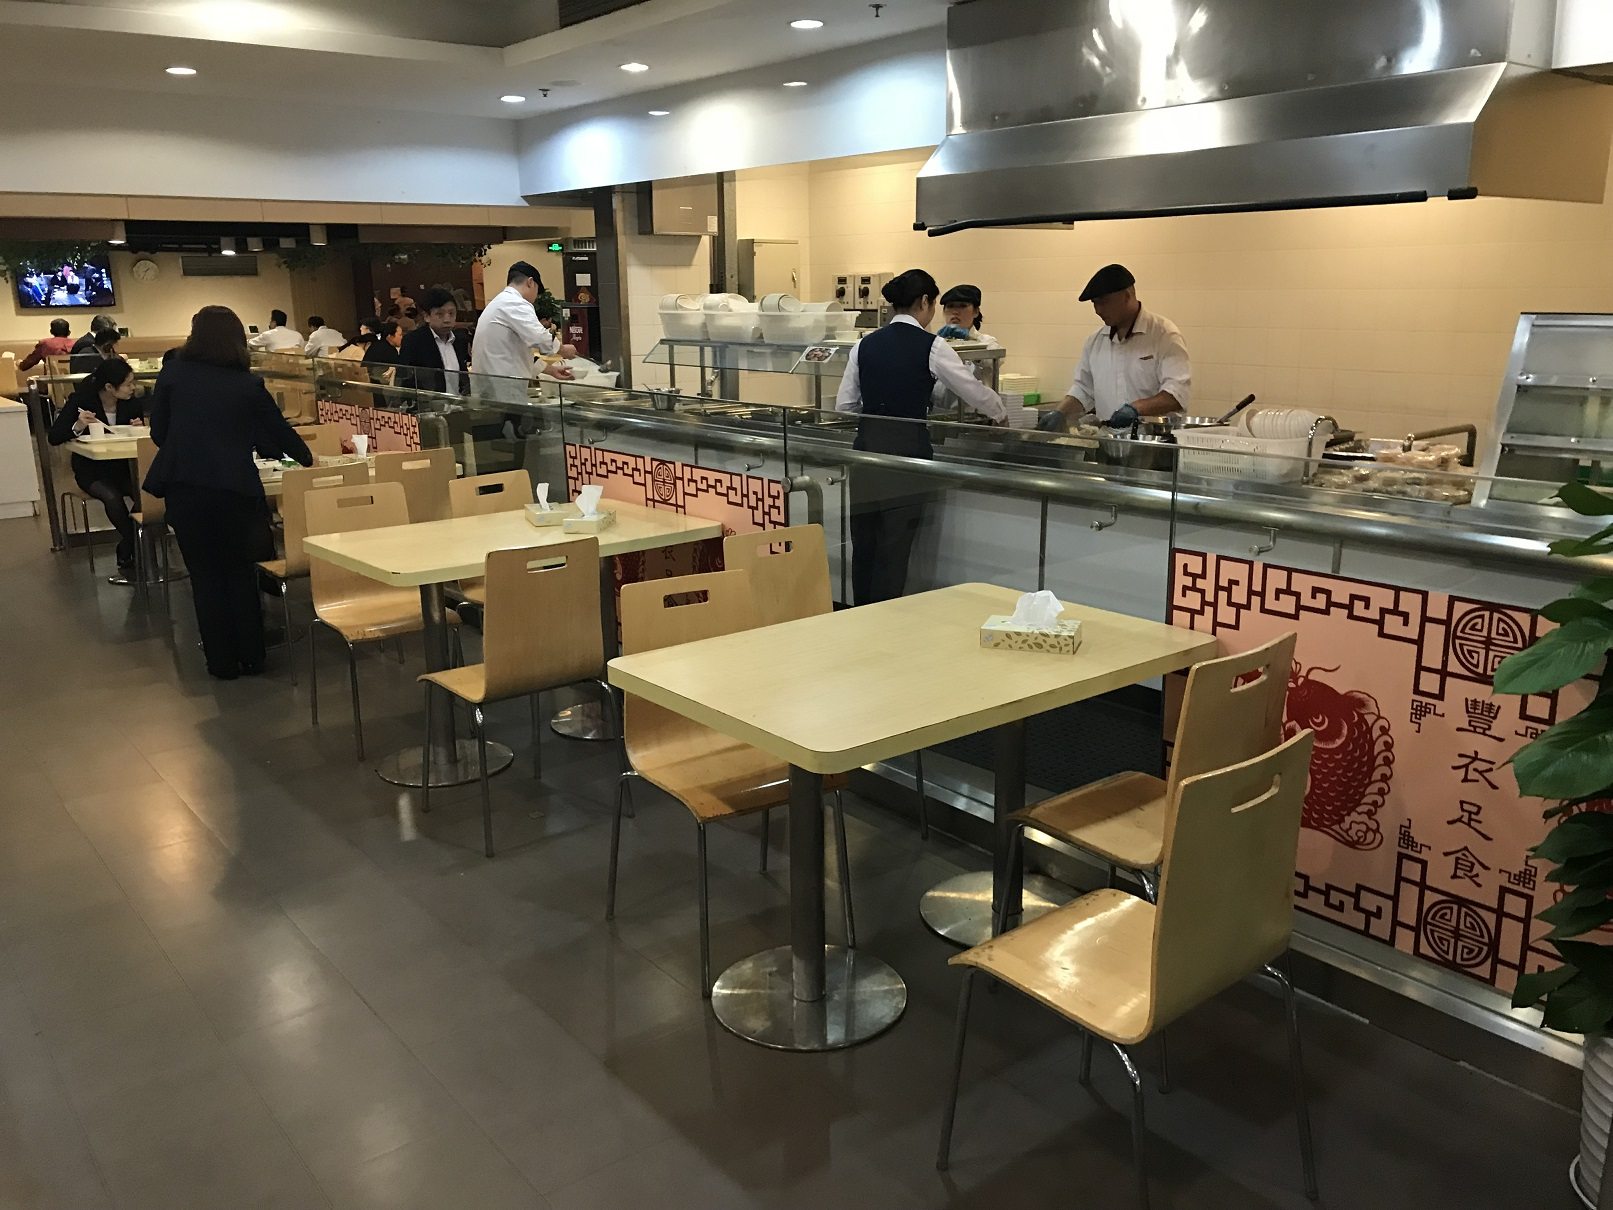 Checking out employee canteen Jing An cafe!